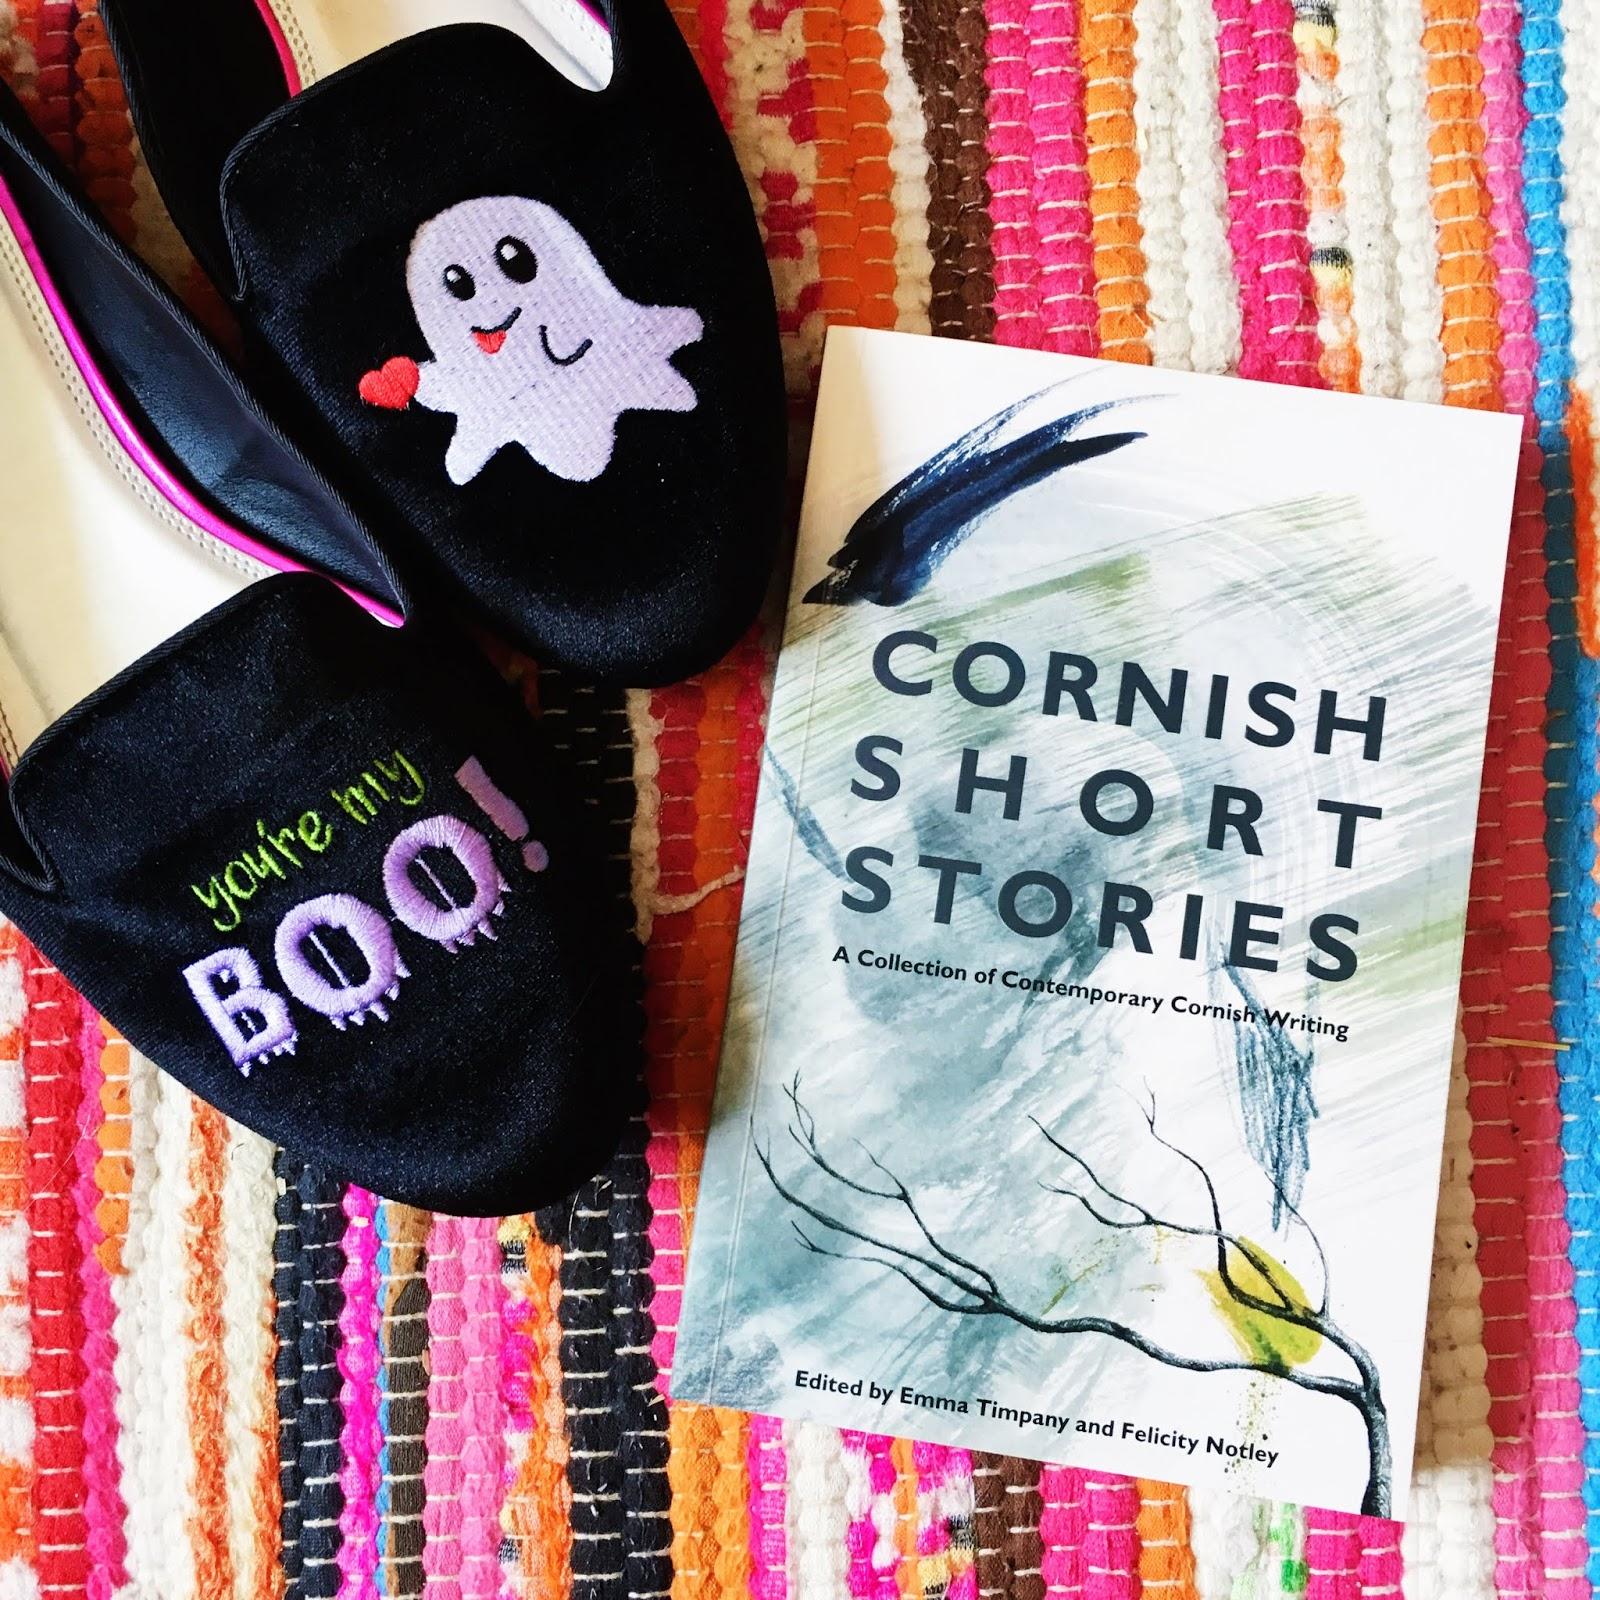 Anastasia Gammon: The Summer of Cornish Short Stories